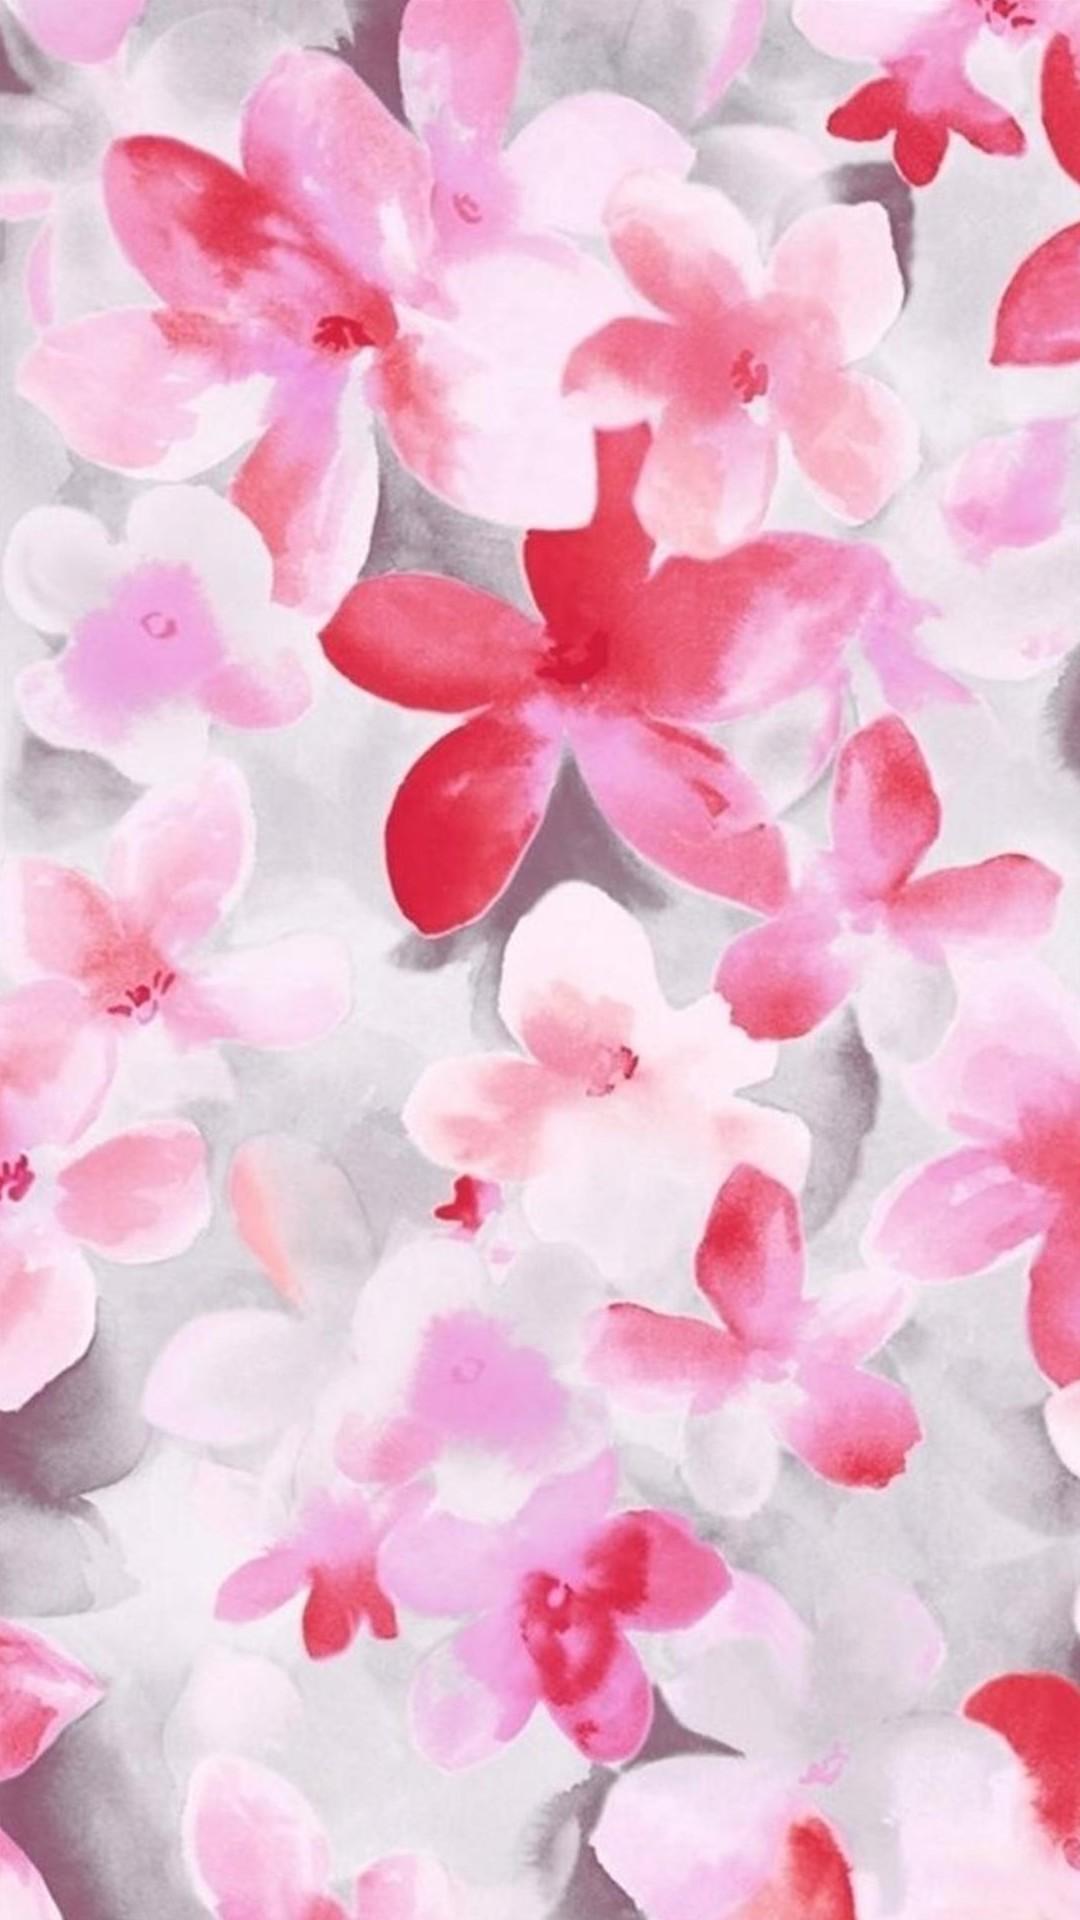 Wallpapers Ipad,Cute Wallpapers,Pink Wallpaper,Iphone …